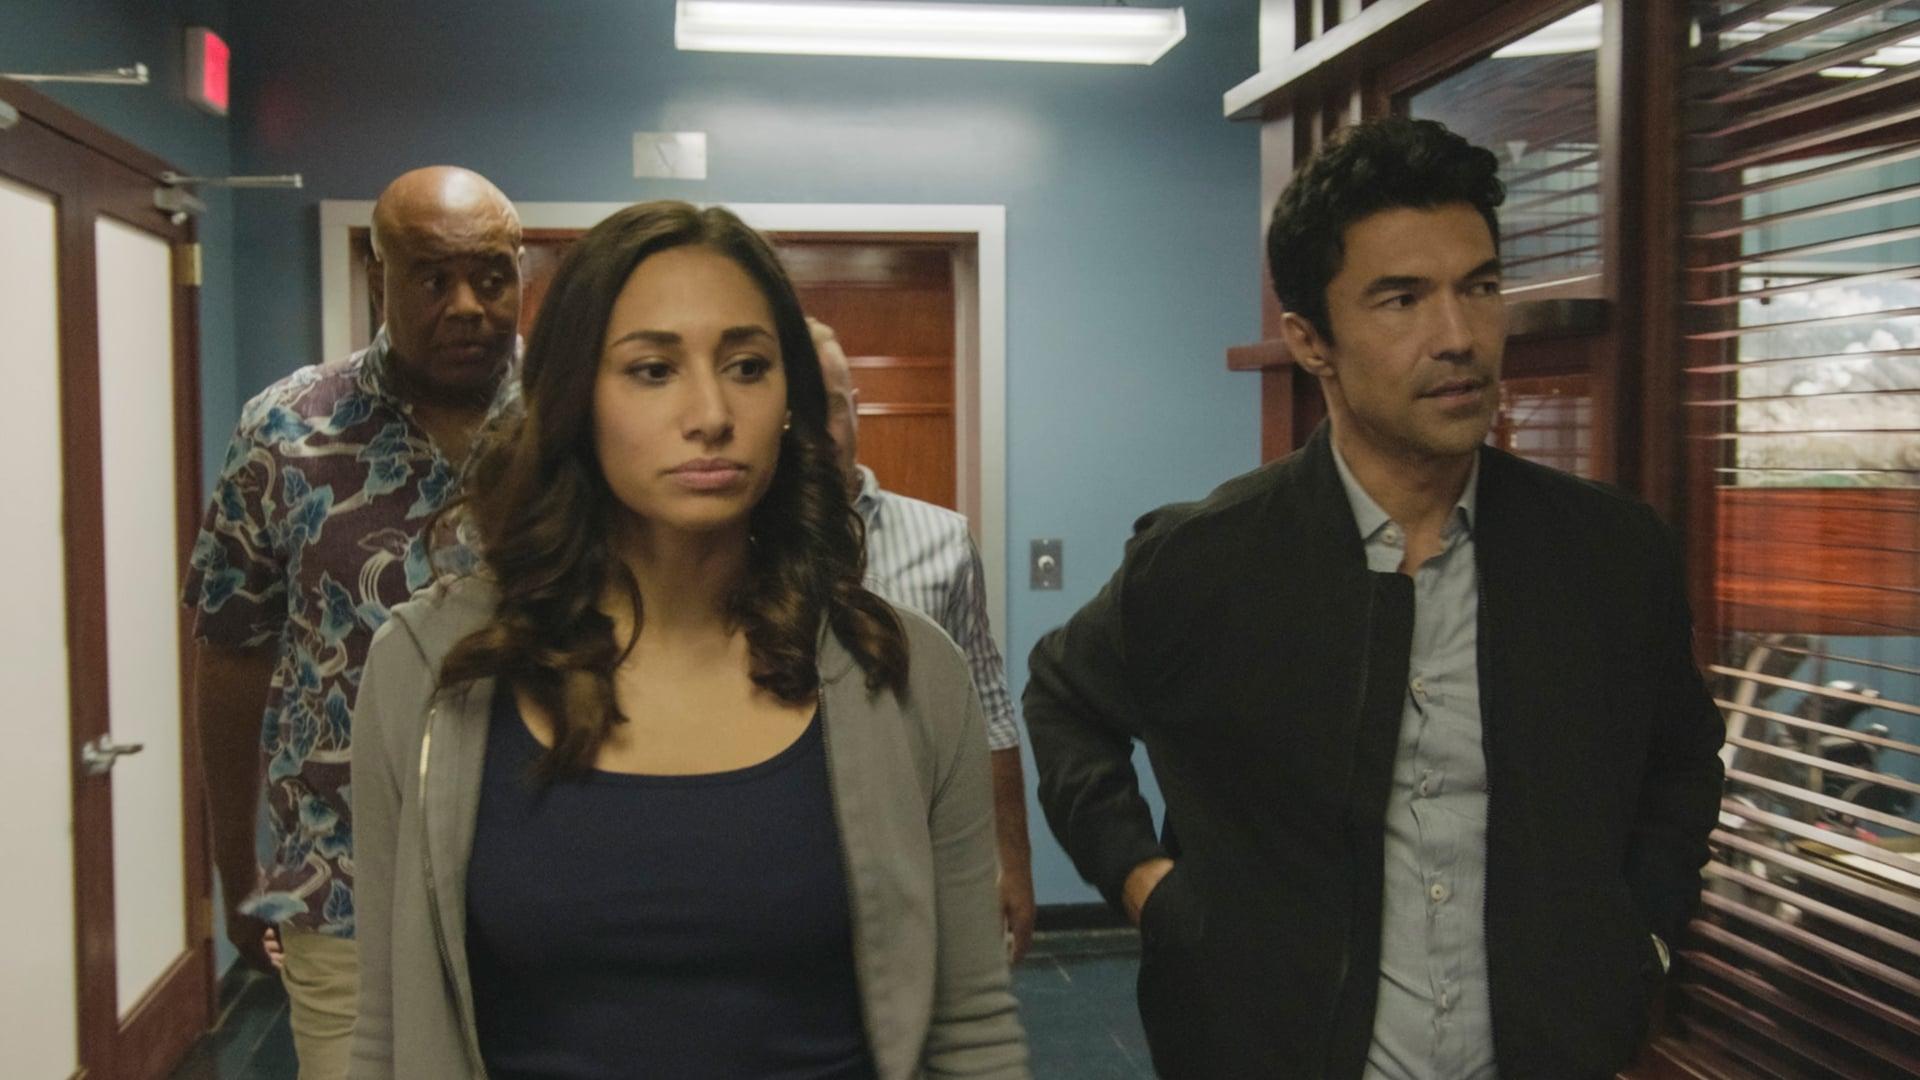 Hawaii Five-0 - Season 10 Episode 7 : Ka 'i'o (DNA)